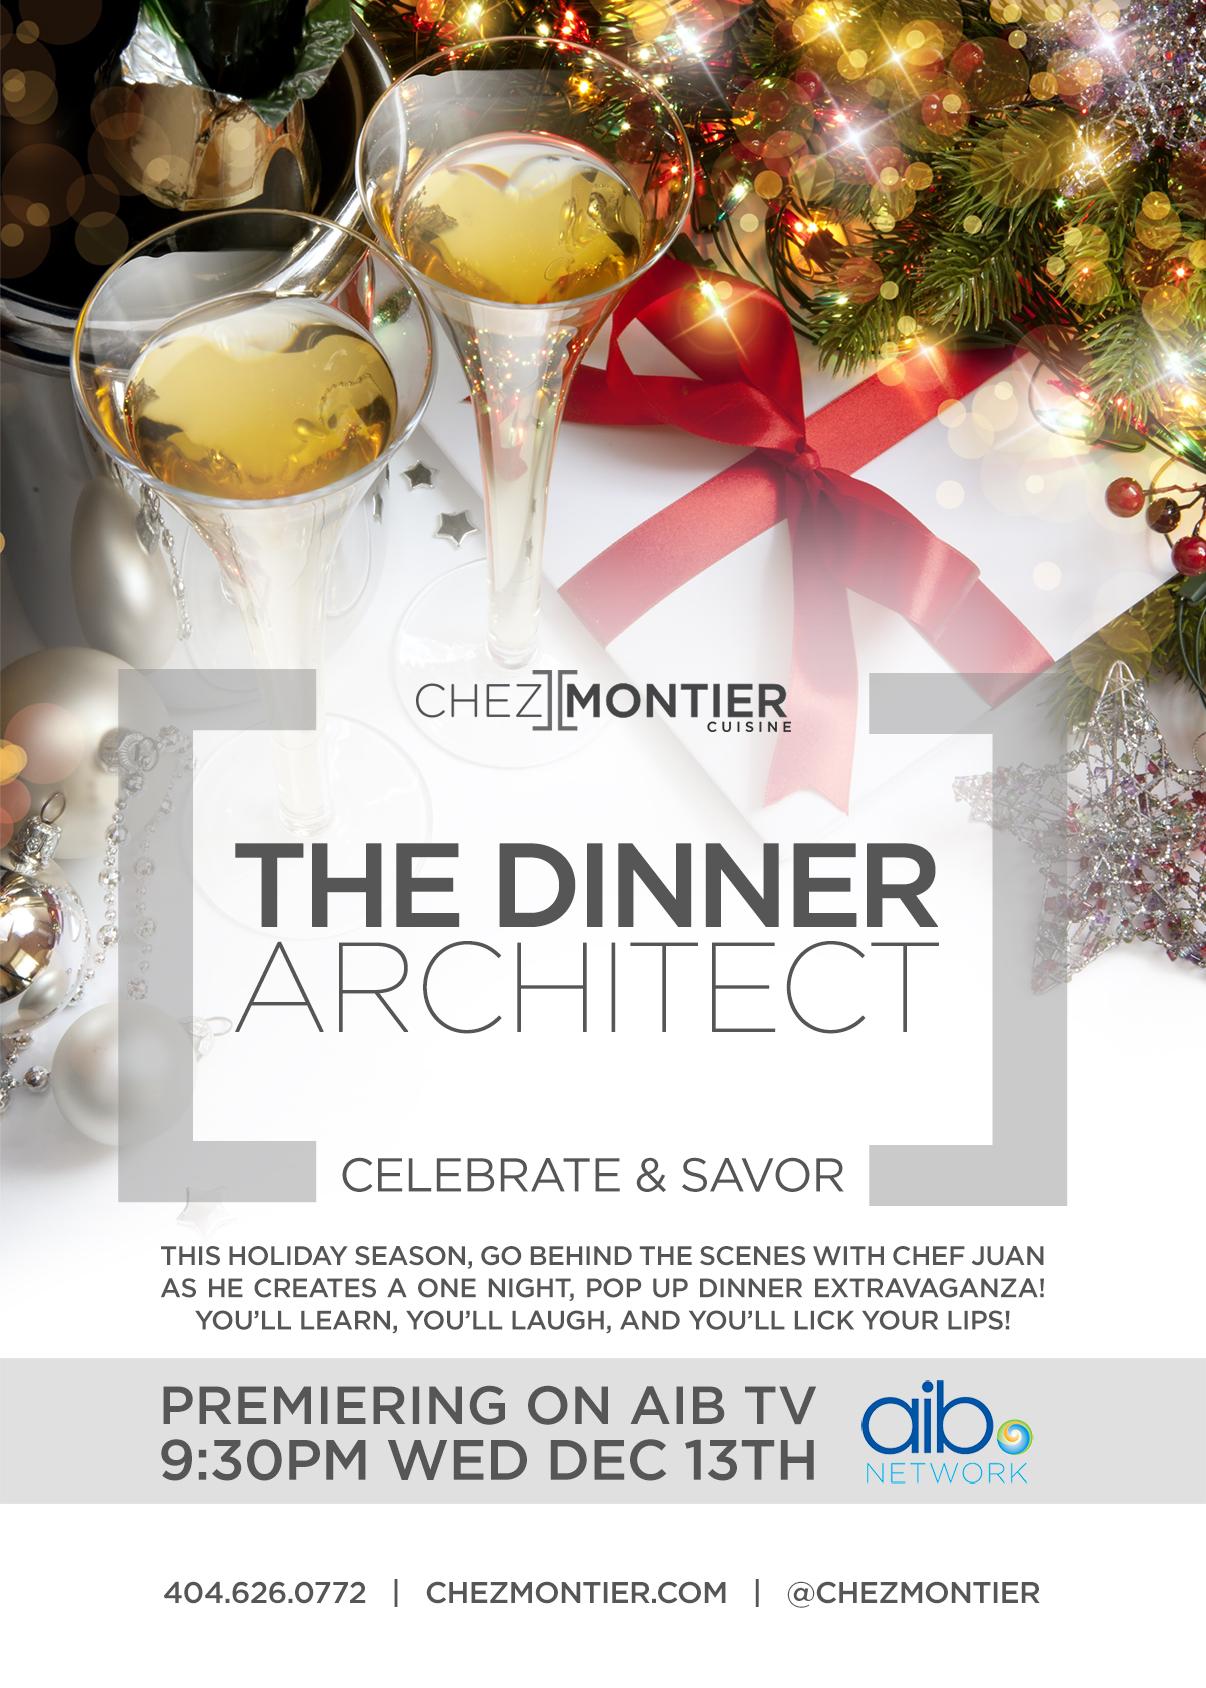 The Dinner Architect Postcard